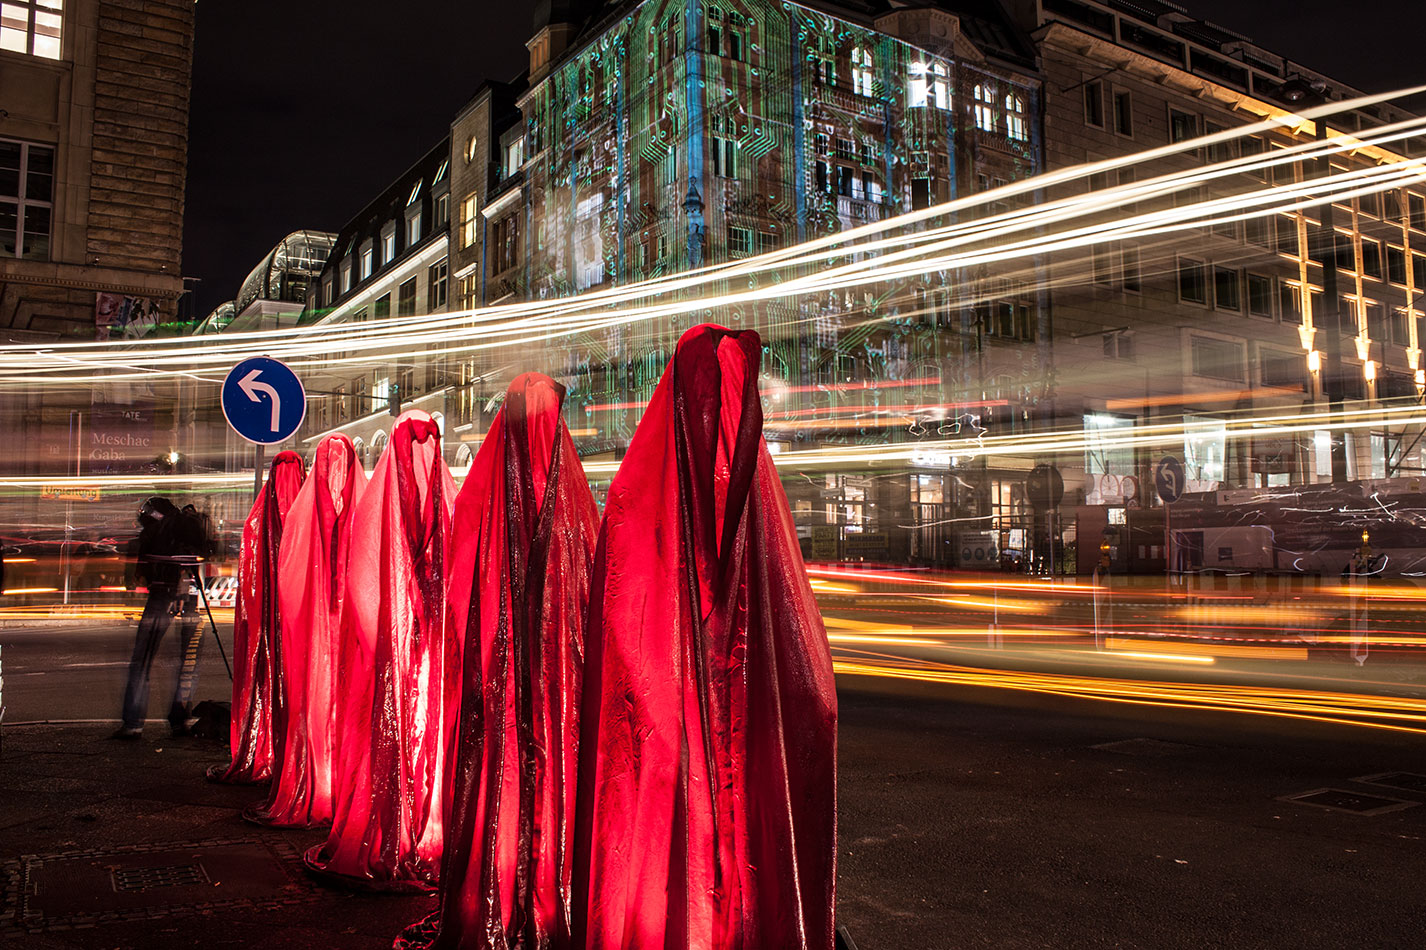 festival-of-lights-berlin-microsoft-light-art-show-exhibition-lumina-guardians-of-time-manfred-kili-kielnhofer-contemporary-arts-design-sculpture-3471